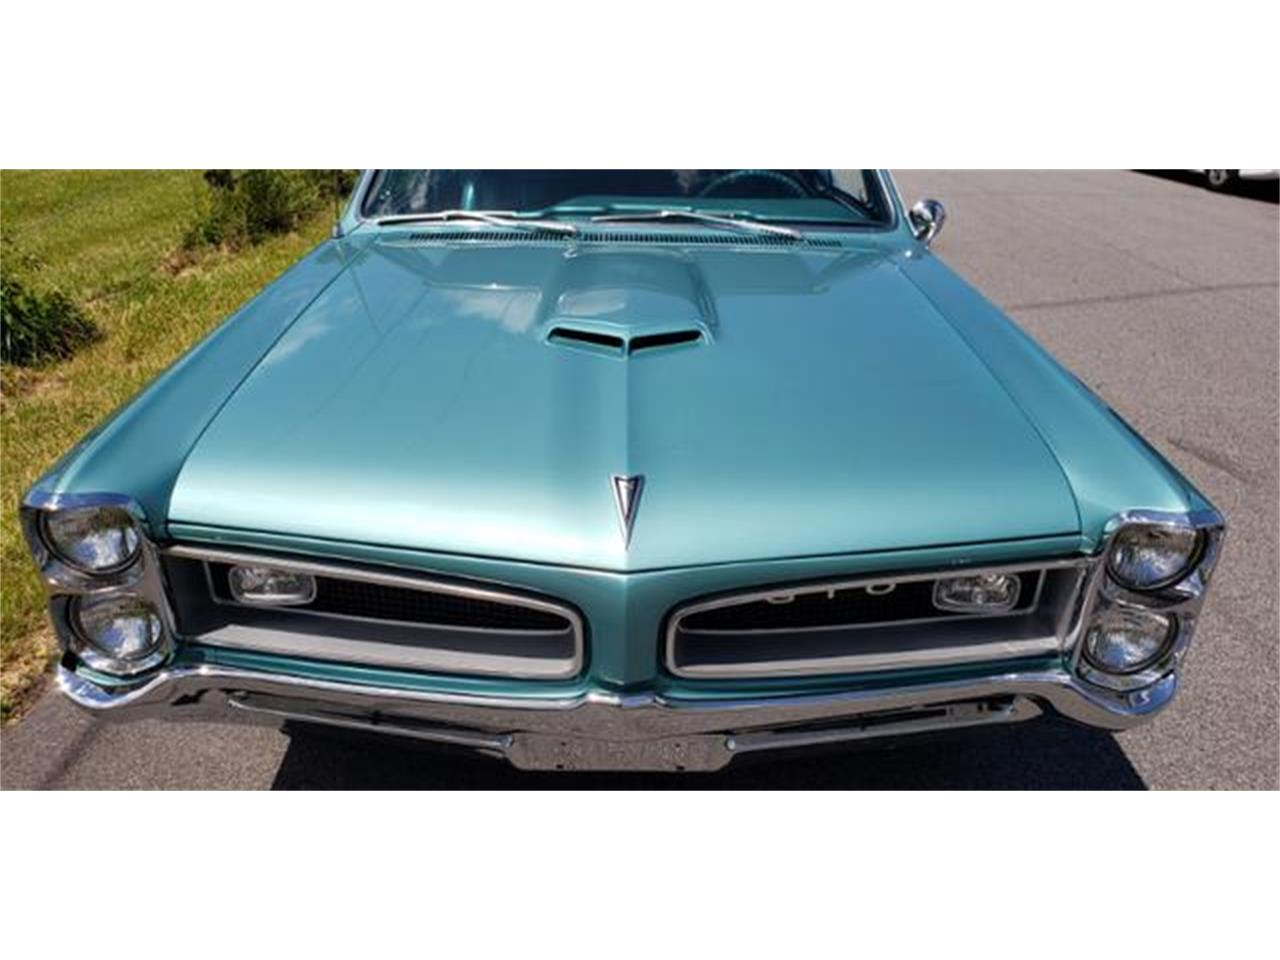 Large Picture of 1966 Pontiac GTO - $52,500.00 - QEBL